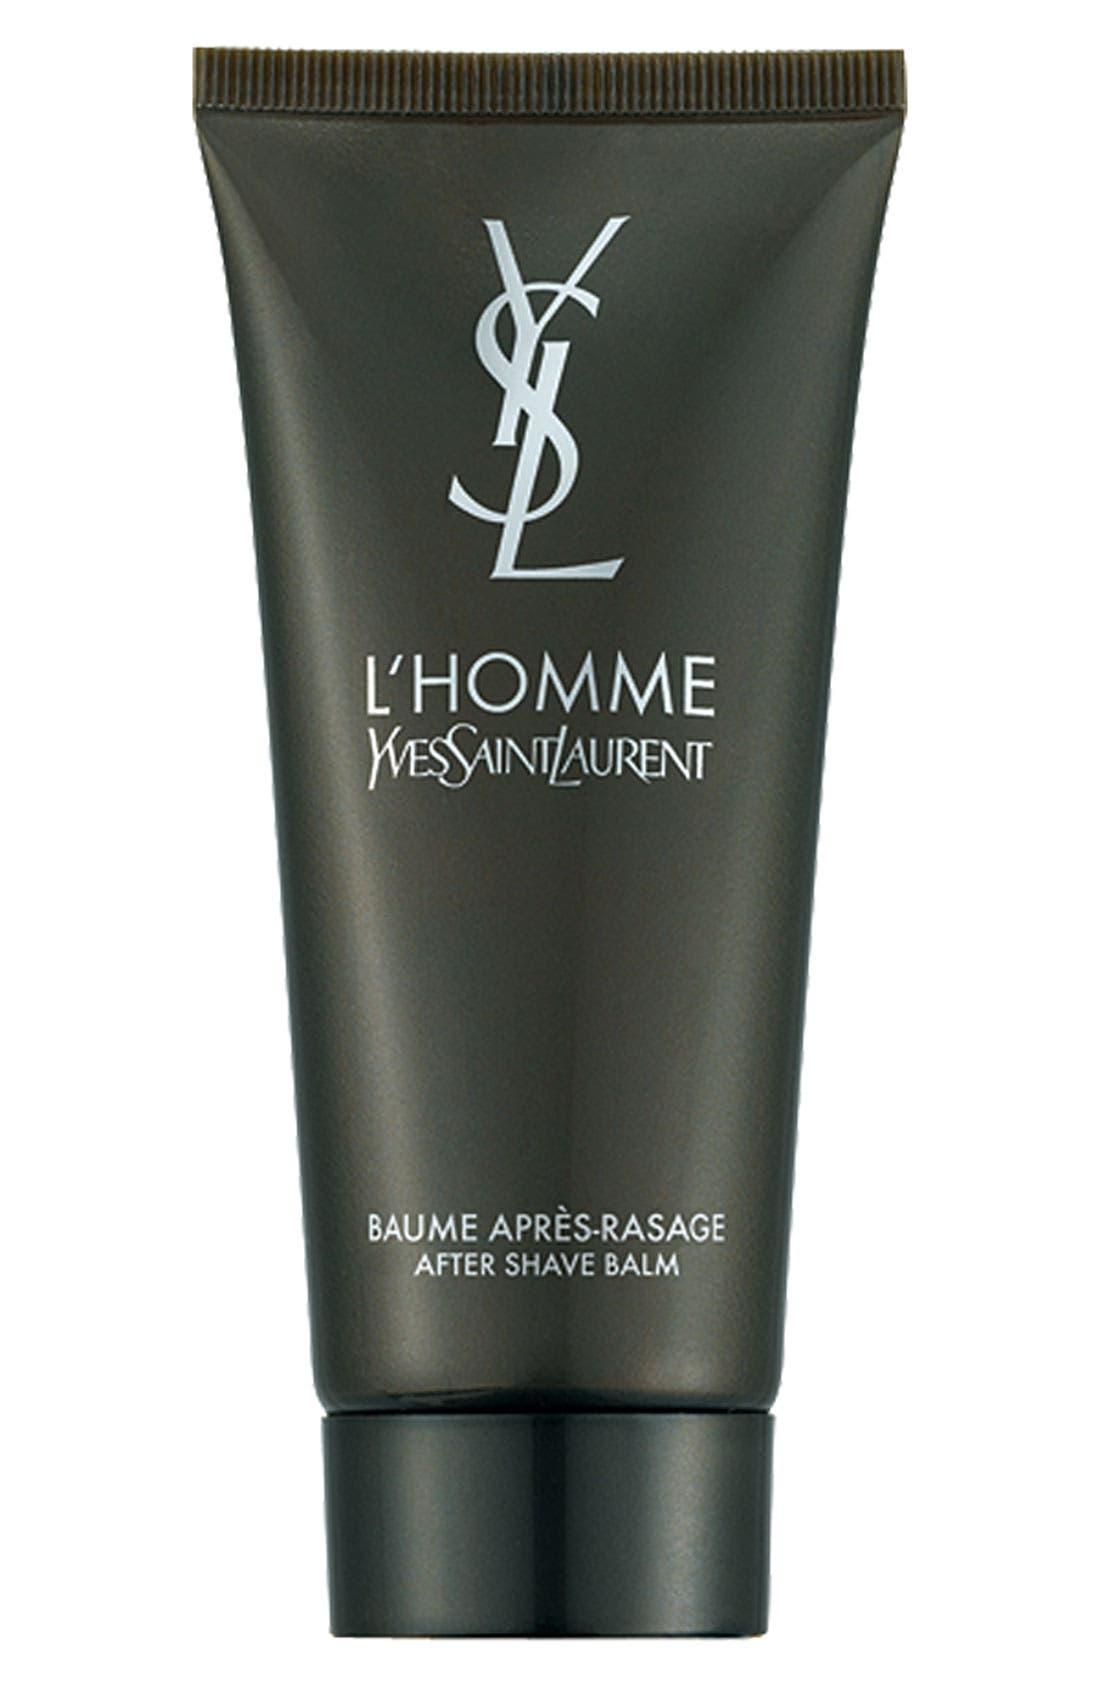 Yves Saint Laurent 'L'Homme' After Shave Balm